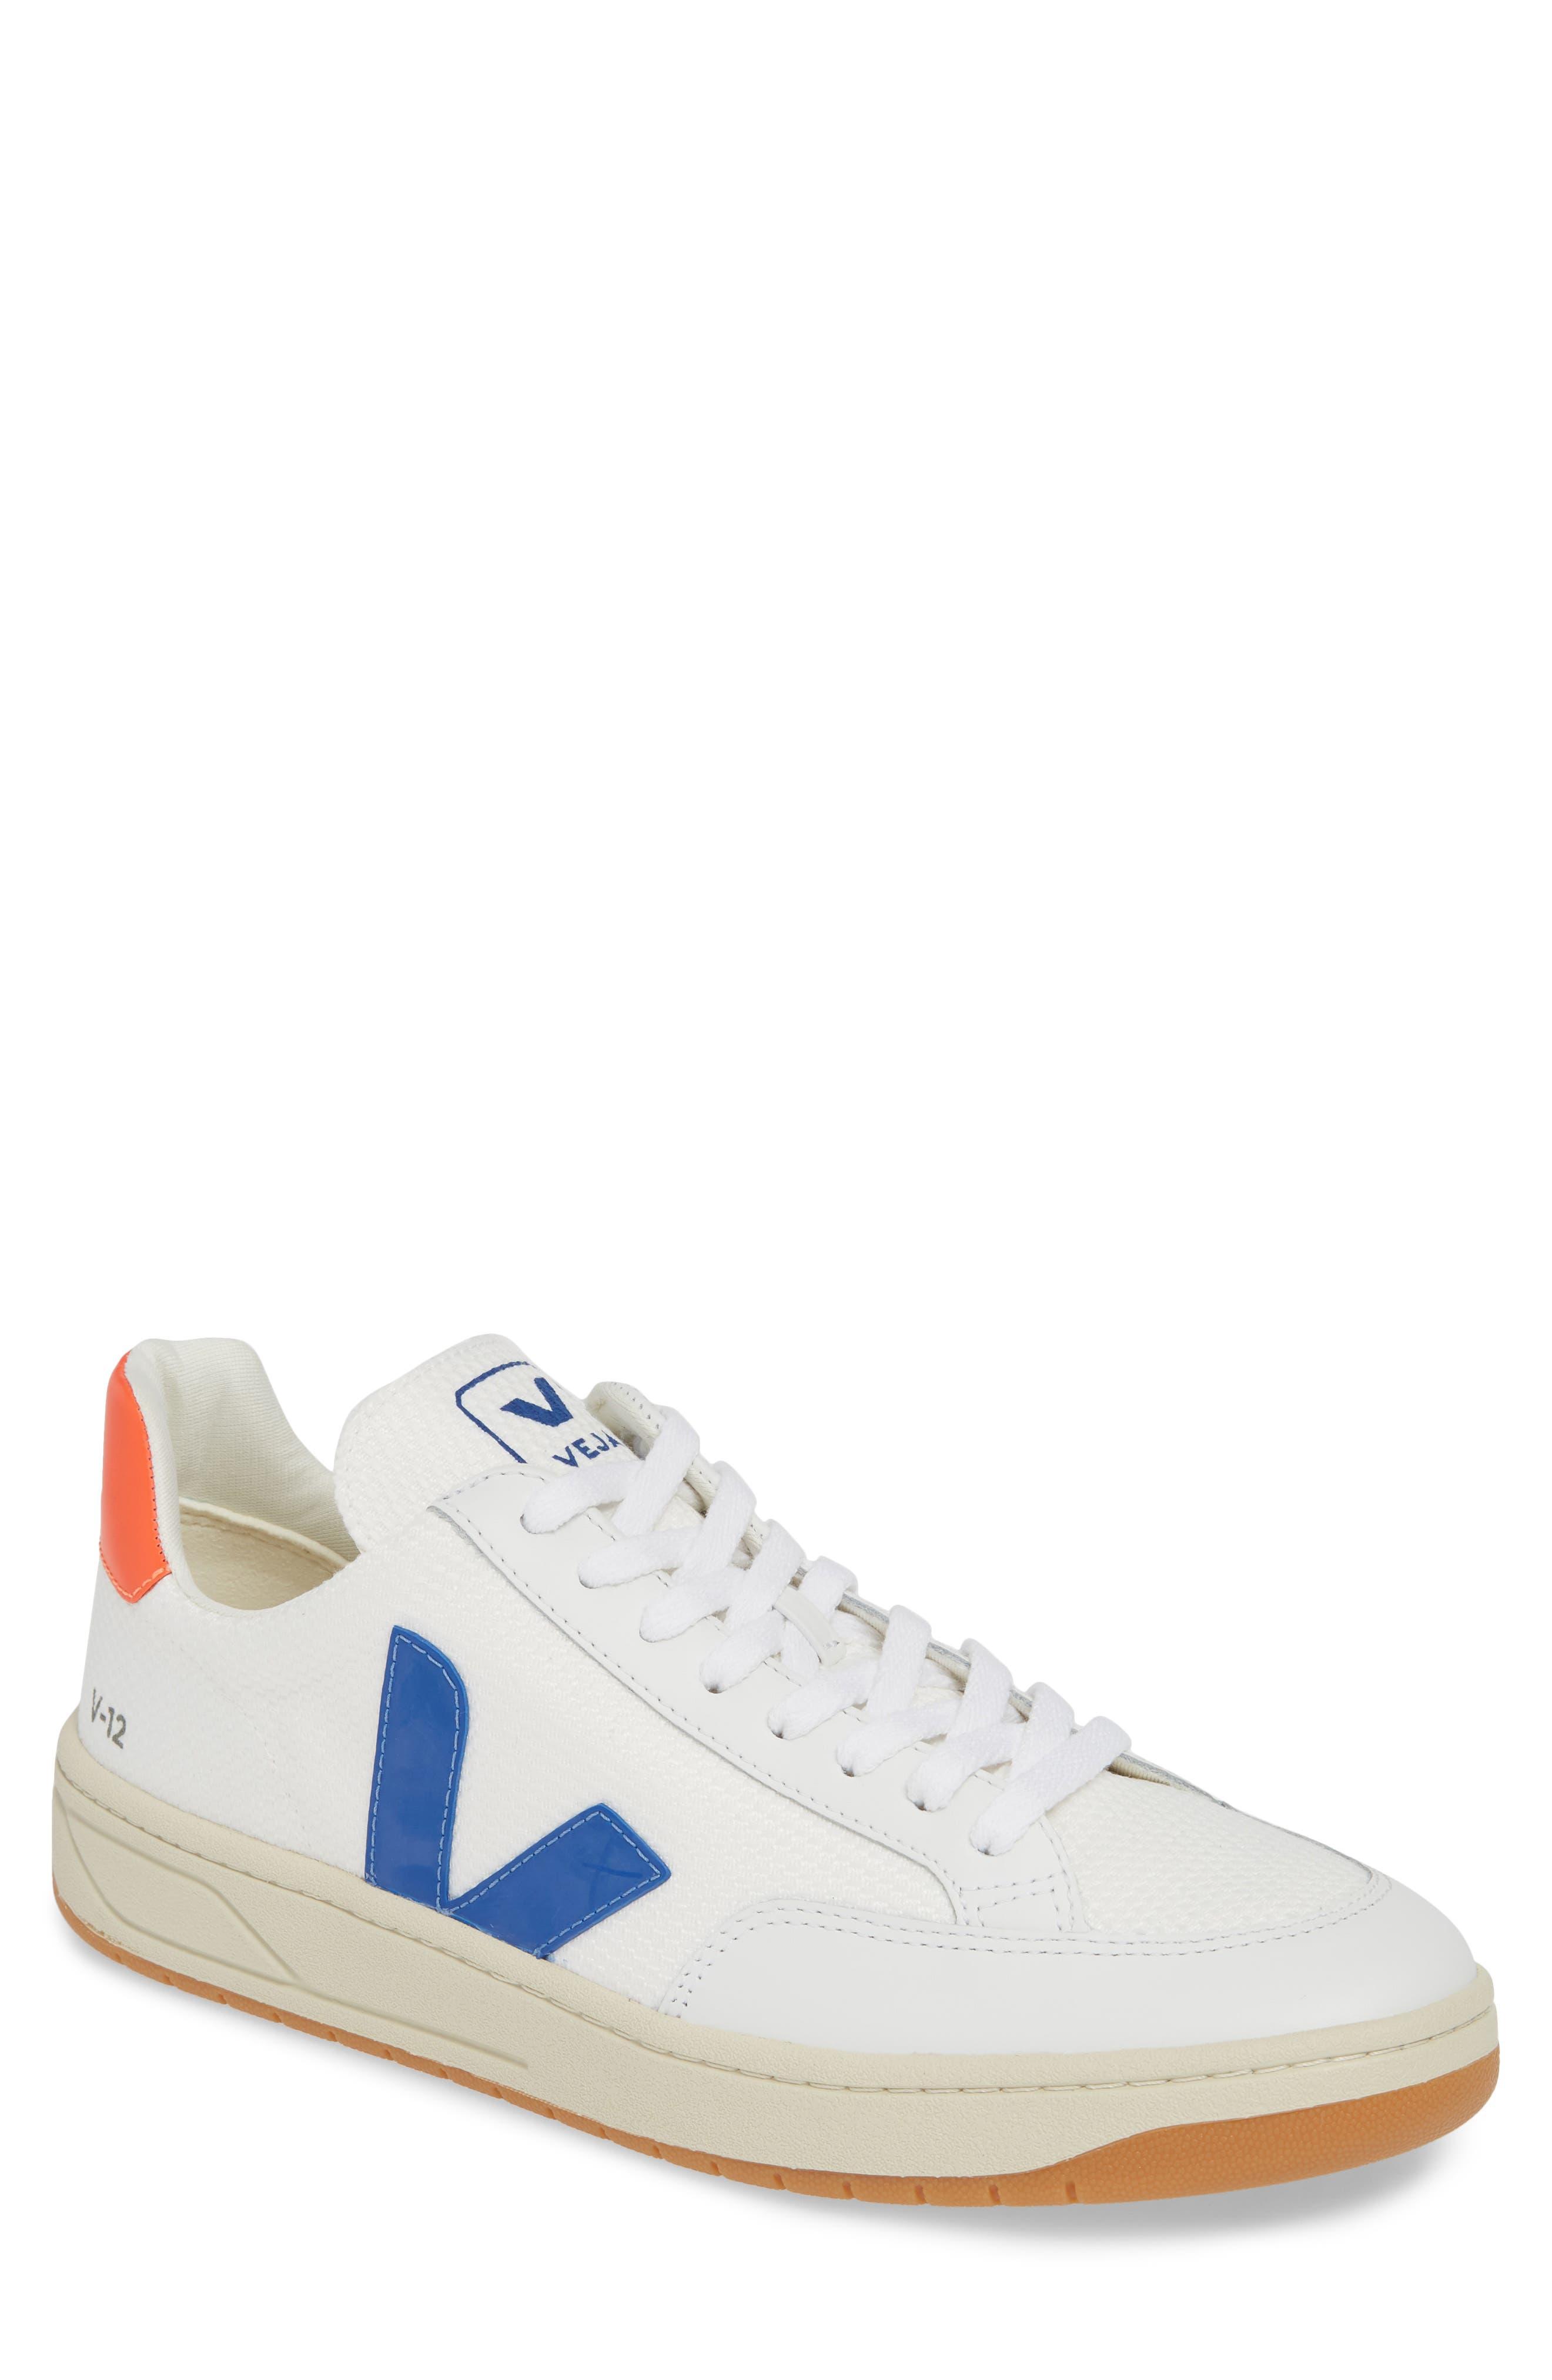 Veja V-12 Sneaker, White